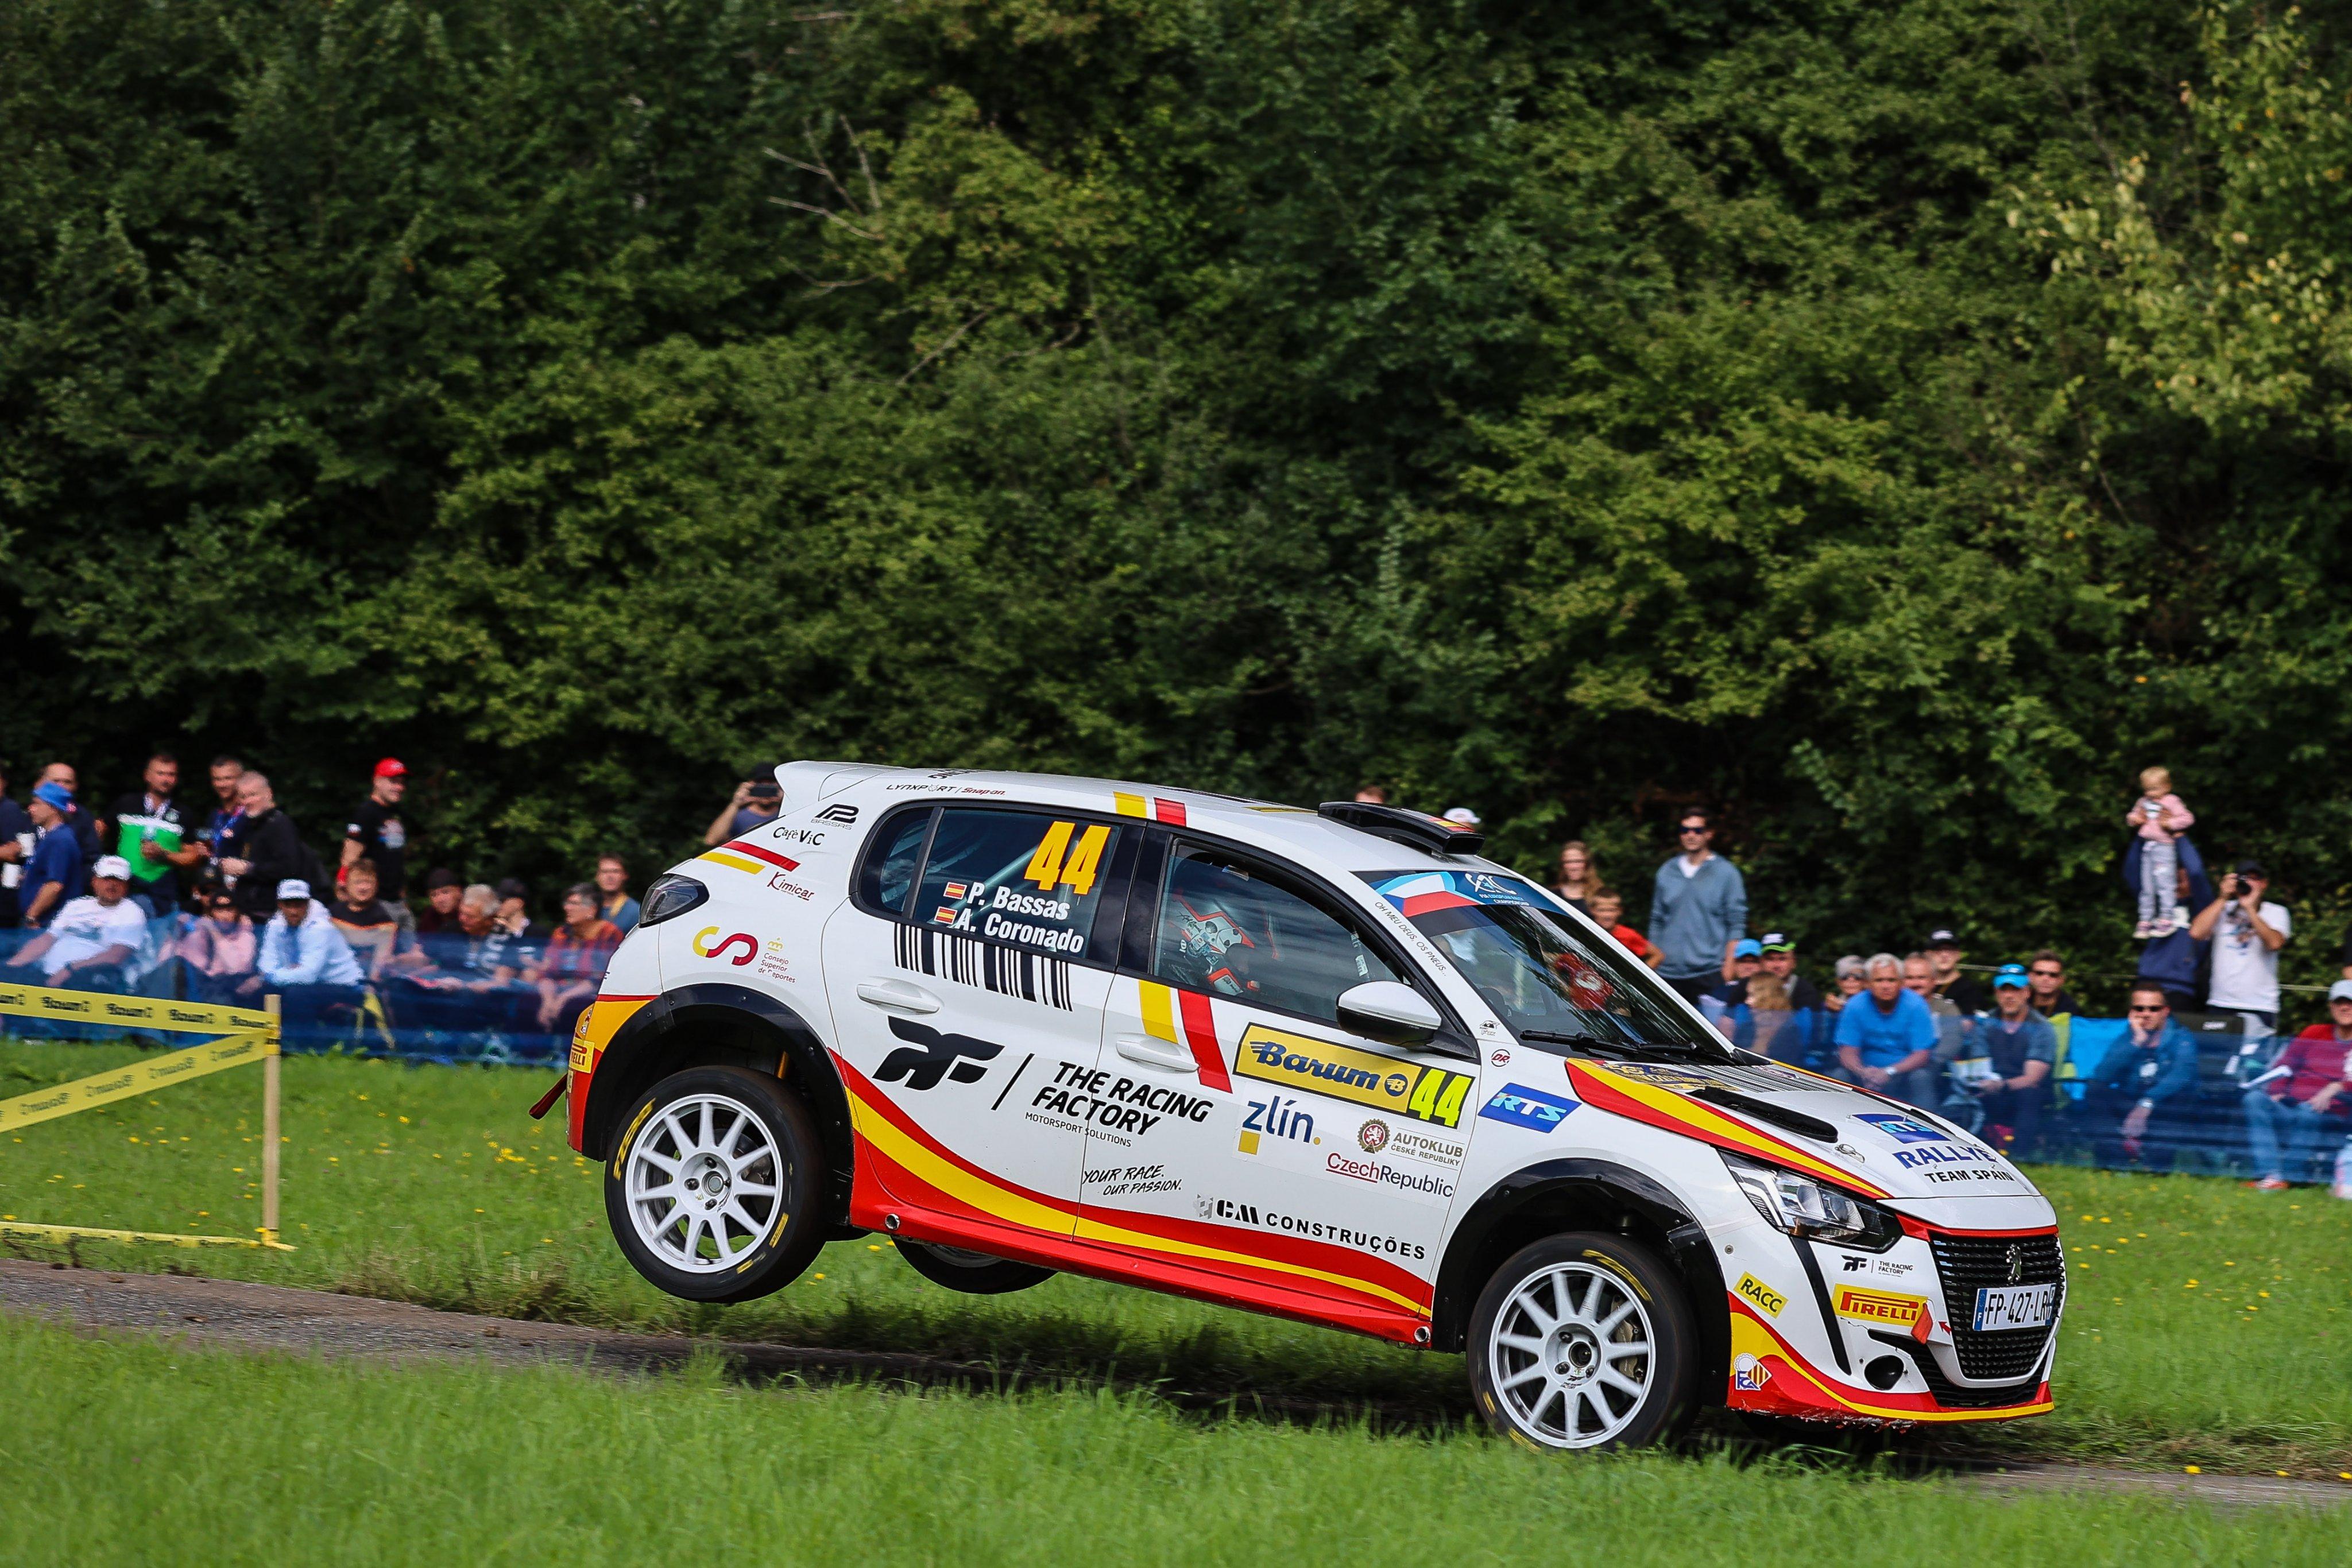 ERC: 50º Barum Czech Rally Zlin [27-29 Agosto] - Página 2 E95t5FTWYAUKceF?format=jpg&name=4096x4096